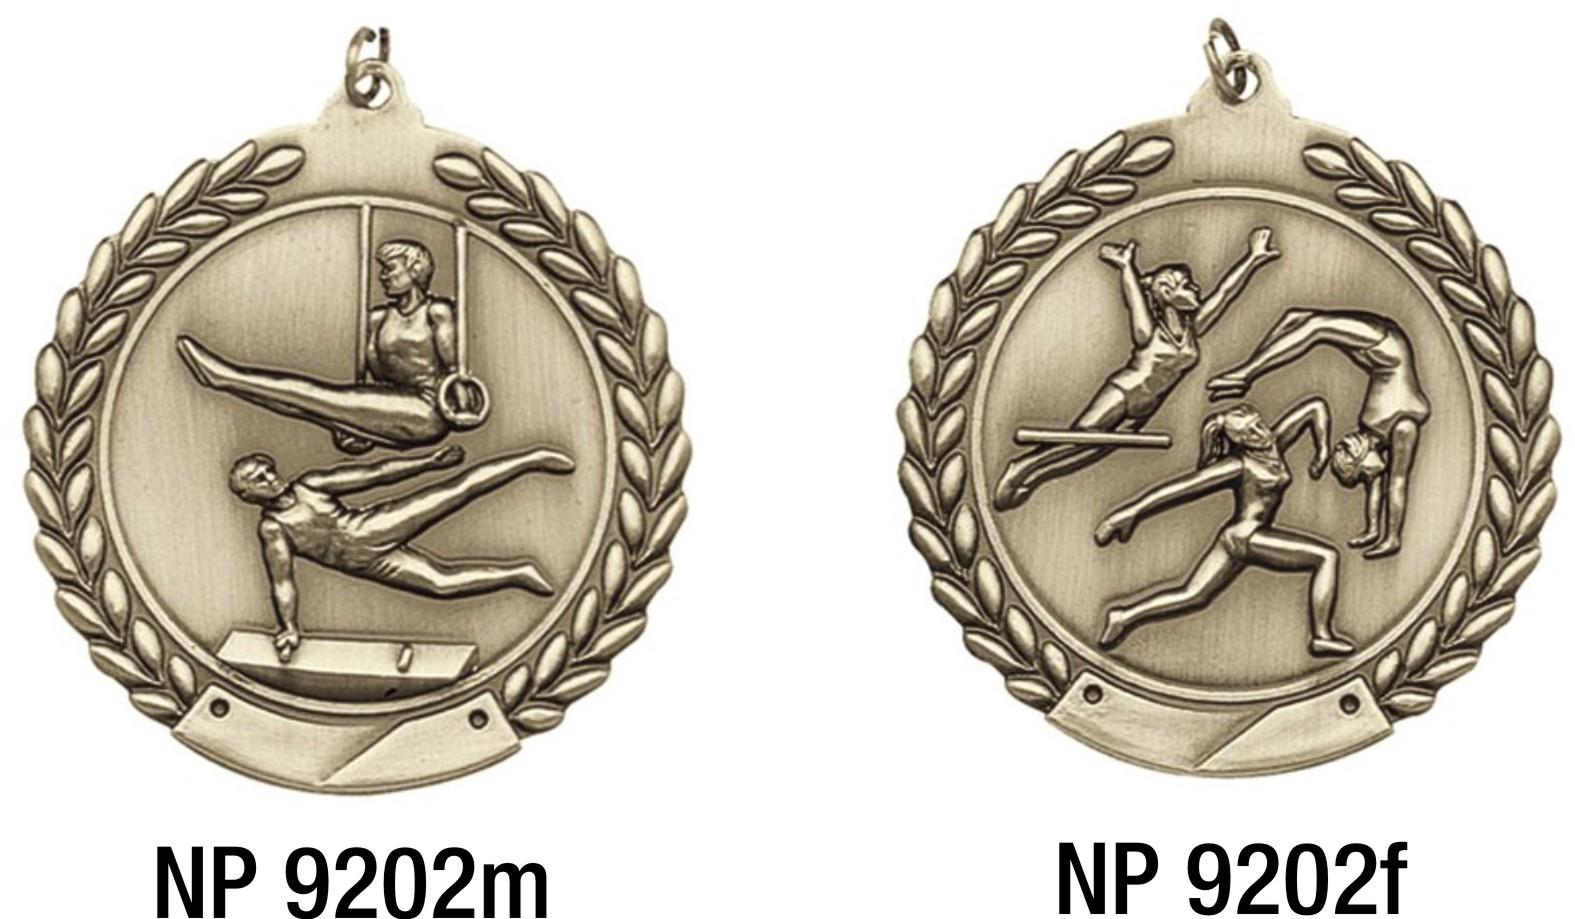 NP9202: Gymnastics Medal